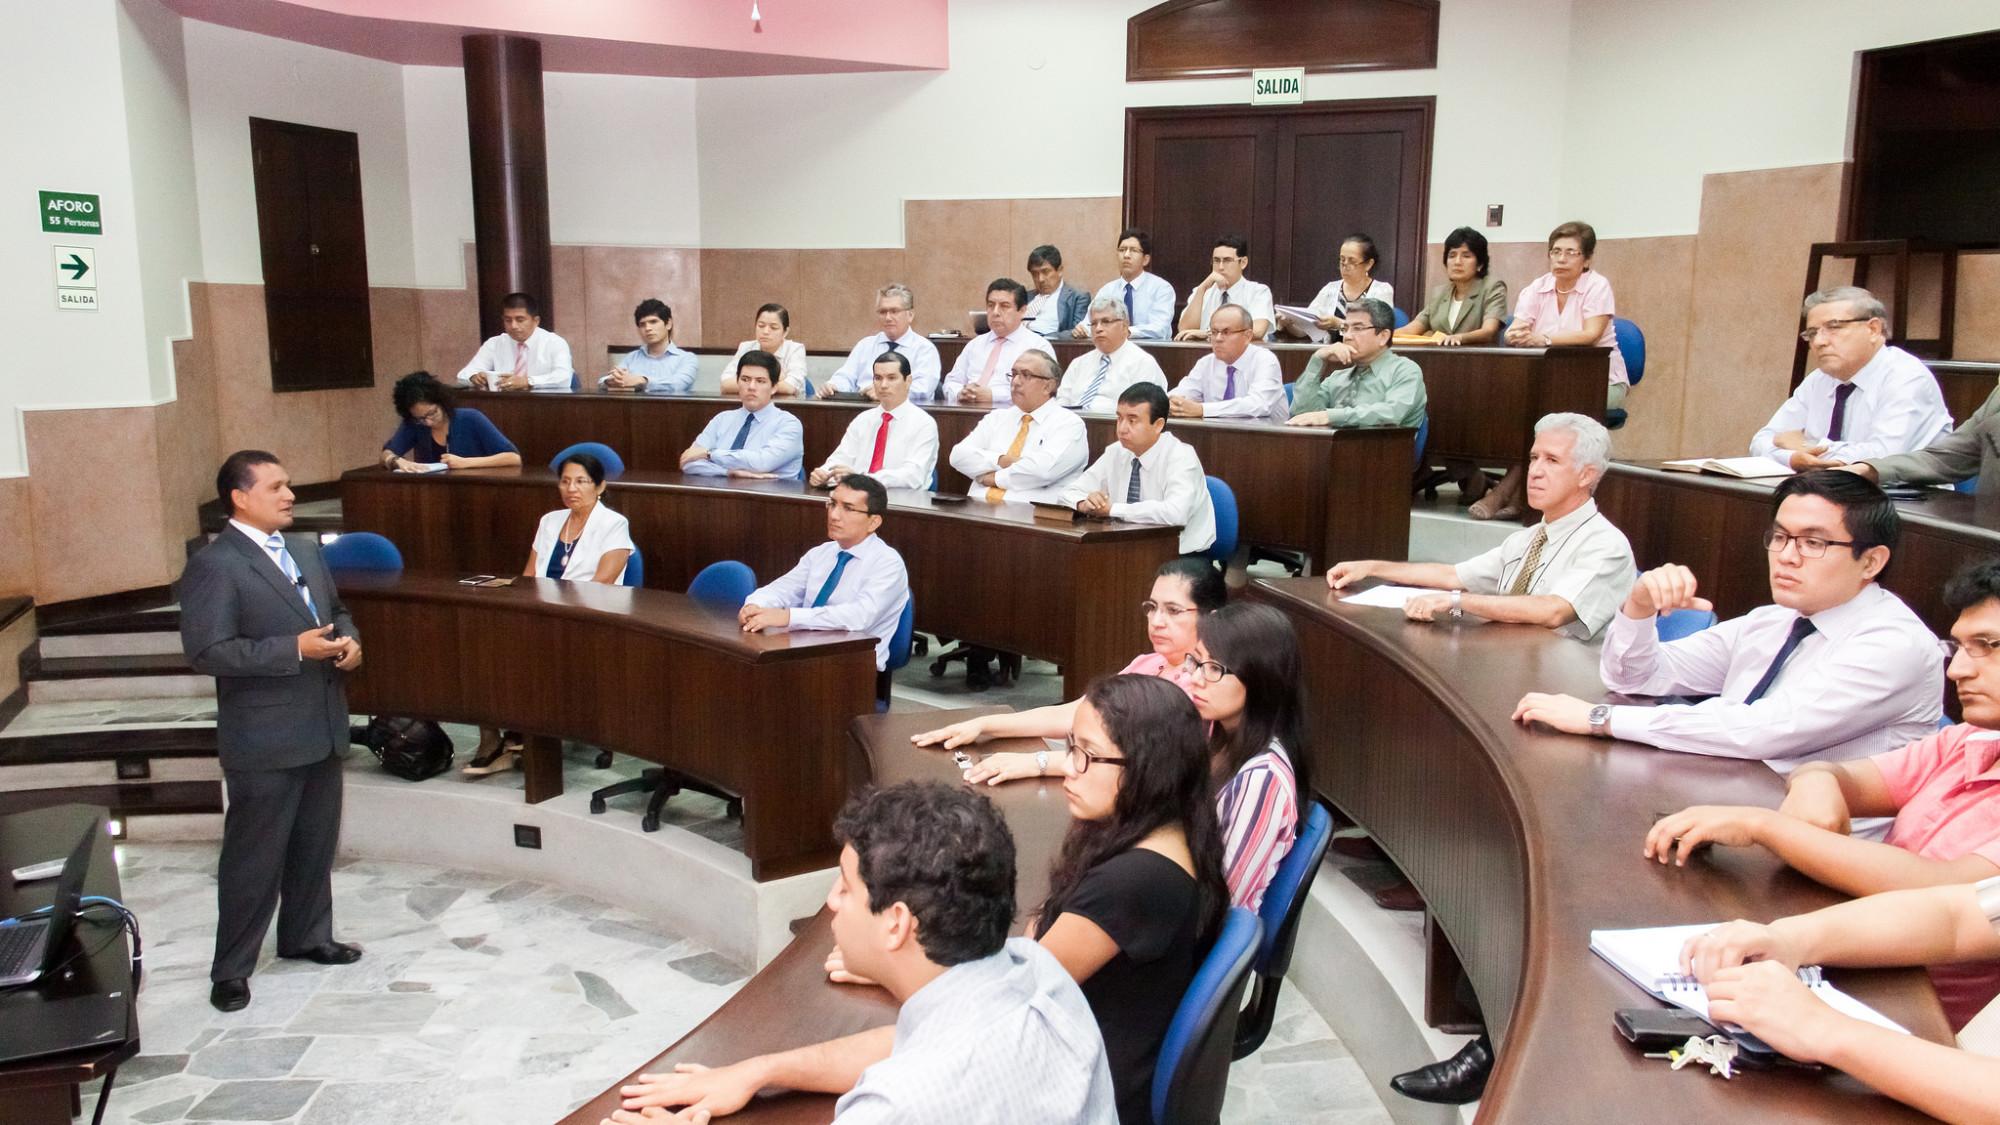 Mgtr. Manuel Mattus, gerente industrial de Caña Brava, durante el Seminario de investigación e innovación.